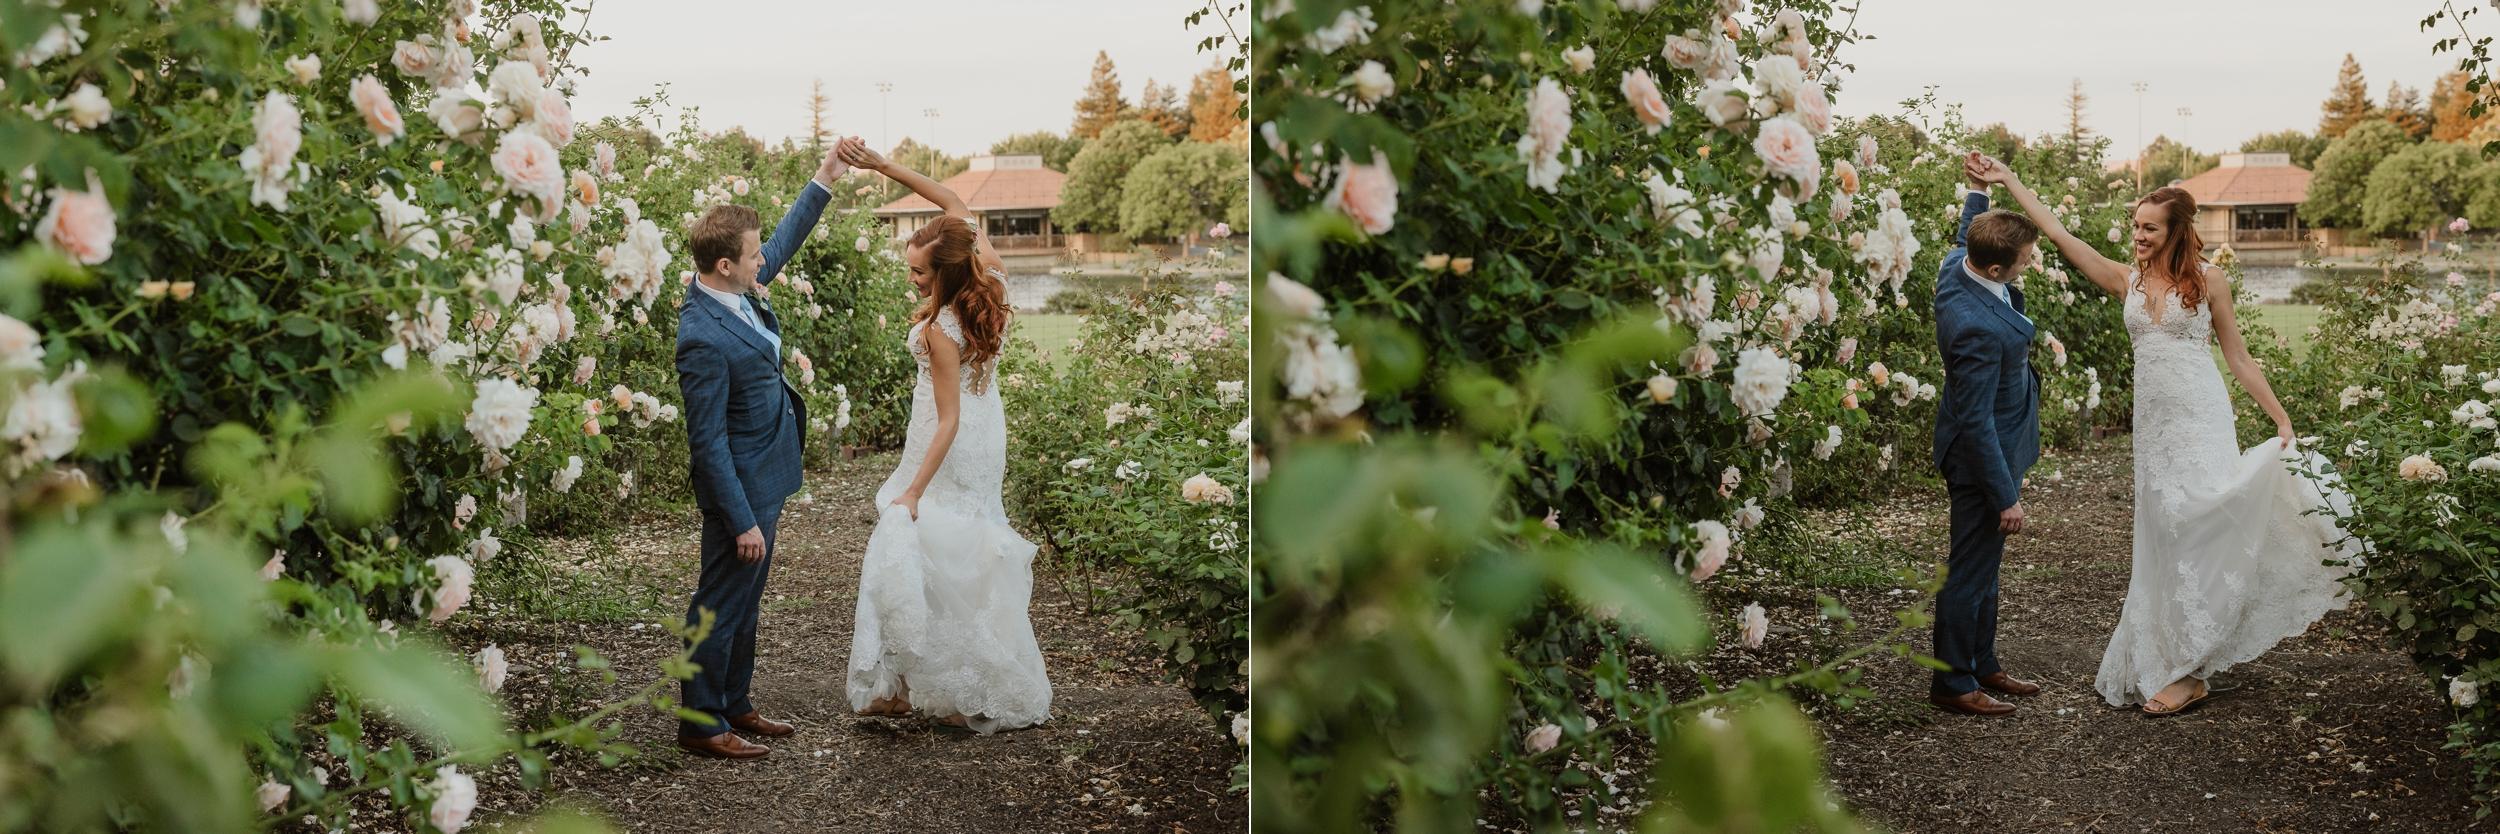 42-walnut-creek-gardens-heather-farms-wedding-vivianchen-494_WEB.jpg